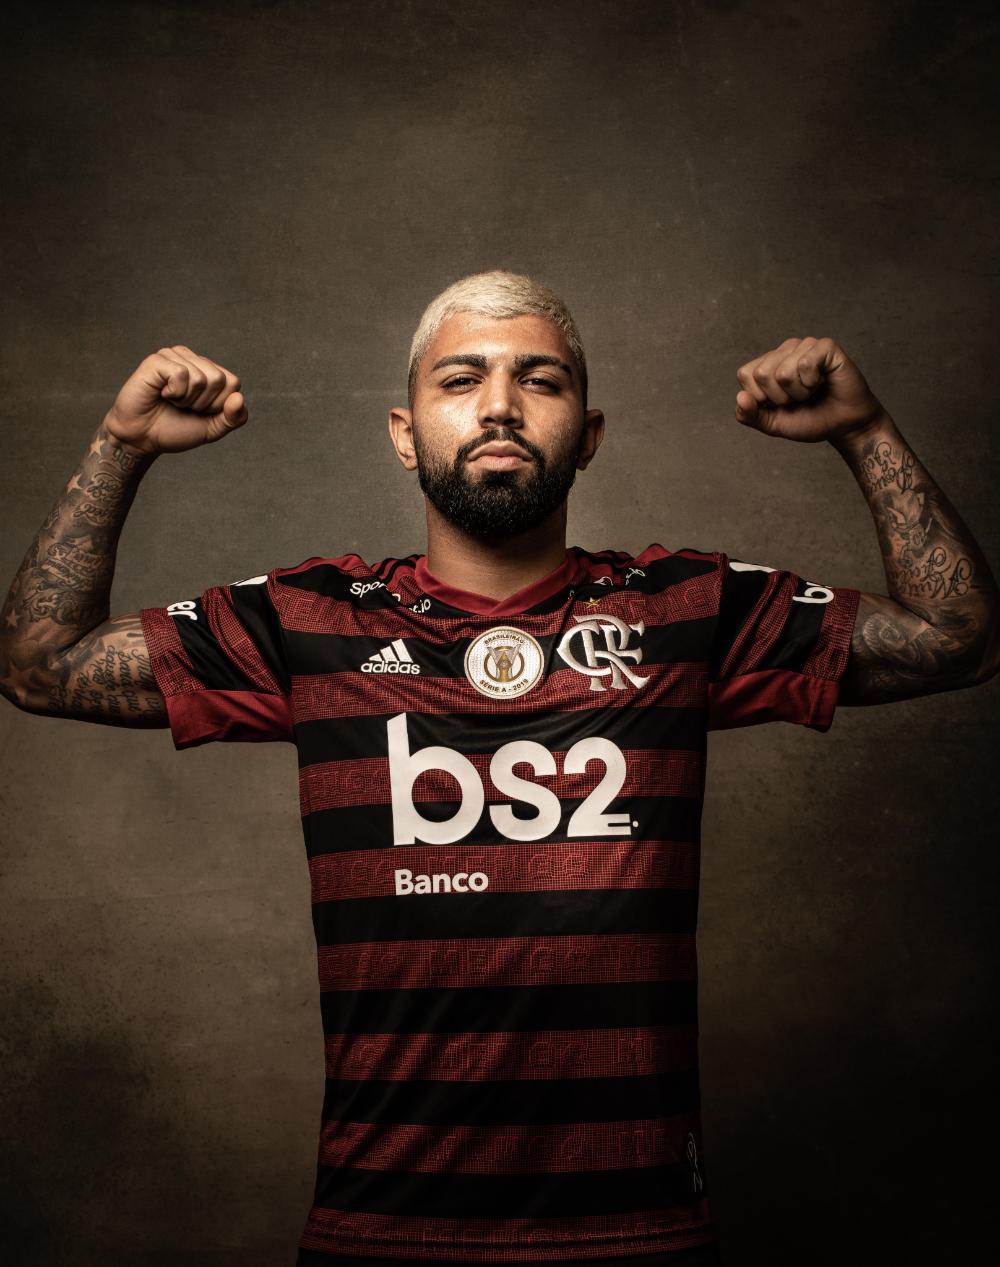 Conmebol Libertadores On Twitter Mens Tshirts Mens Tops Mens Graphic Tshirt